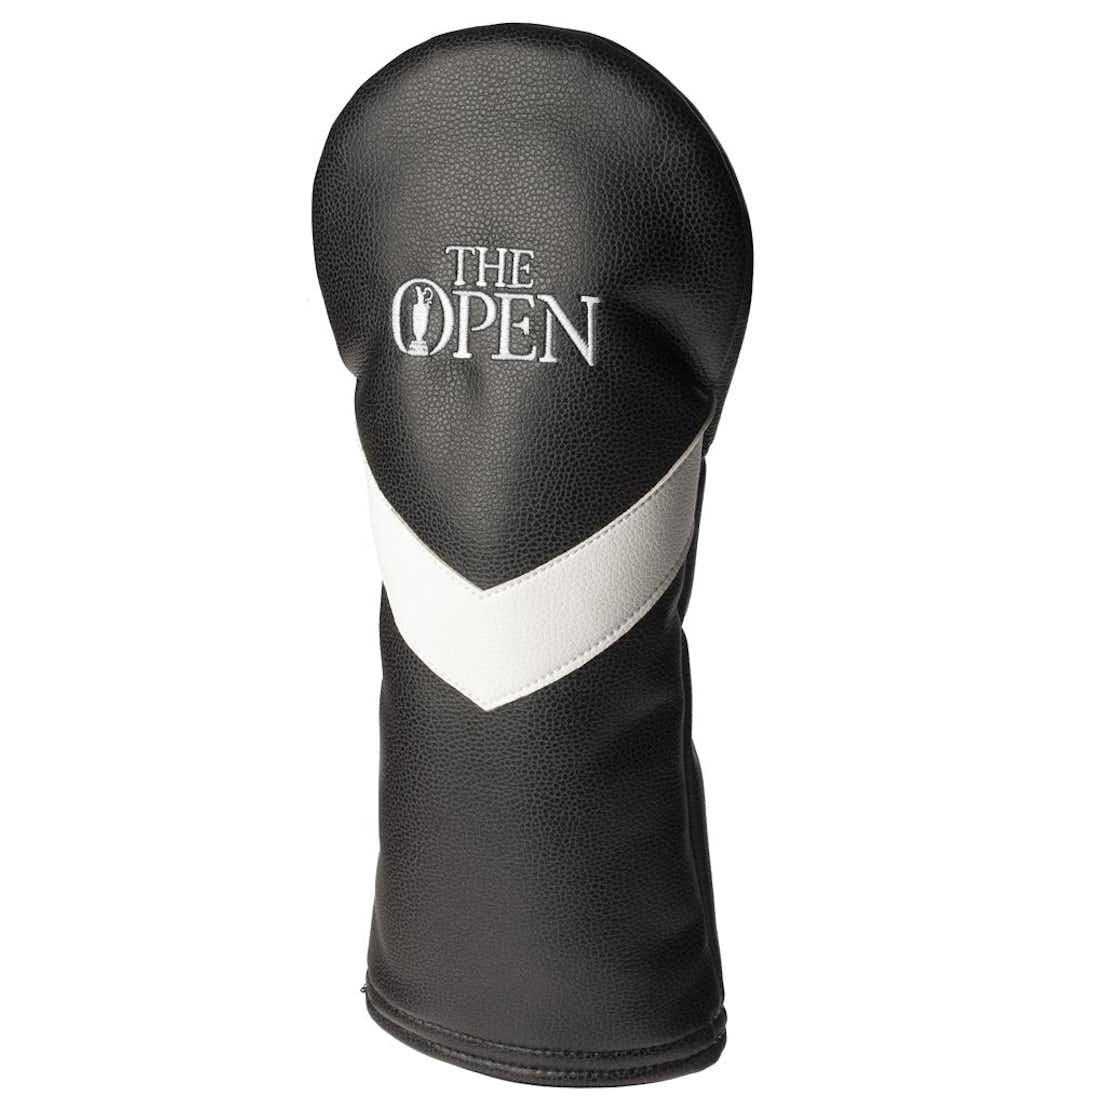 The Open Fairway Cover - Black